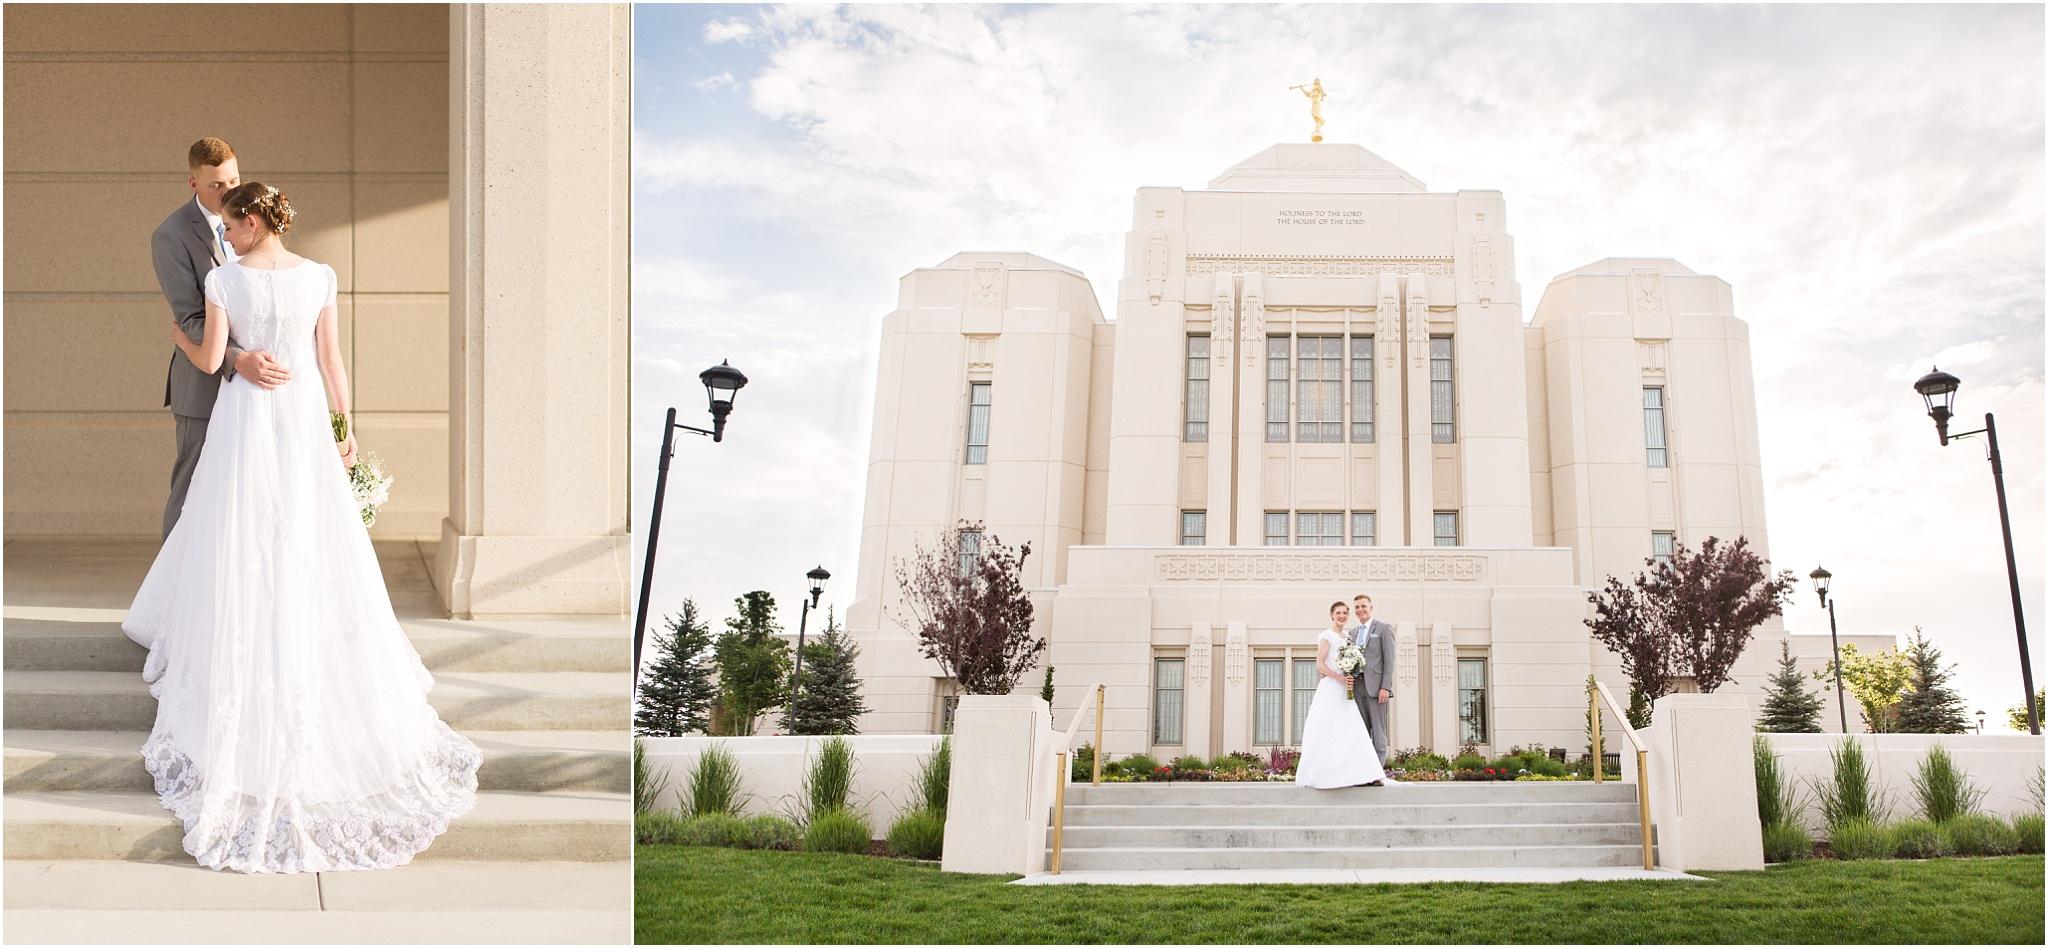 Wedding Photography_Meridian Idaho Temple_Boise Idaho_Leah Southwick Photography_0037.jpg